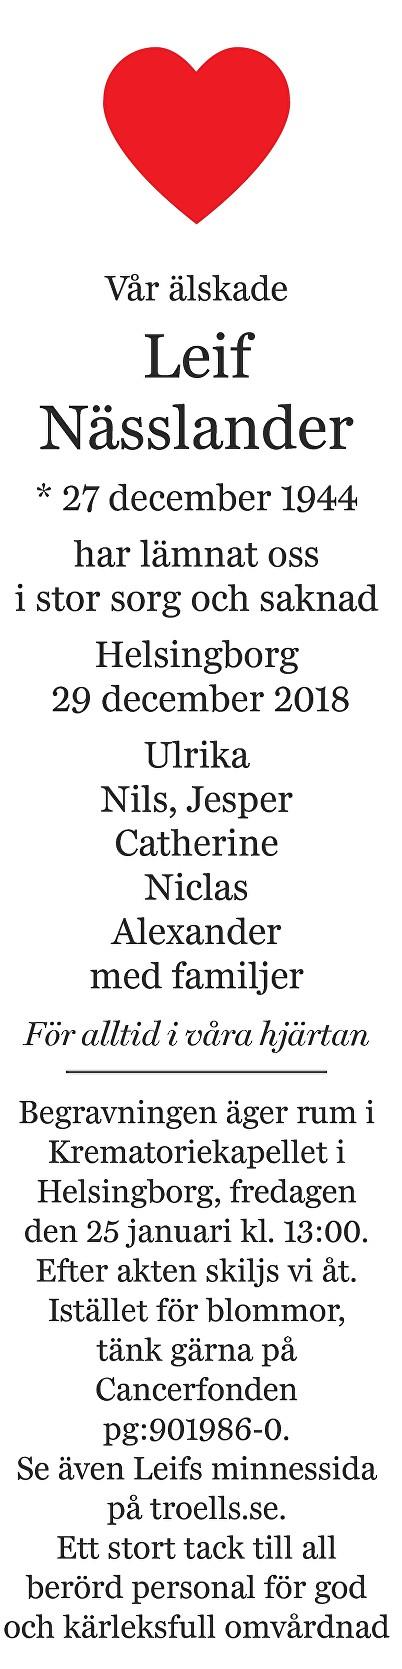 Leif Nässlander Death notice